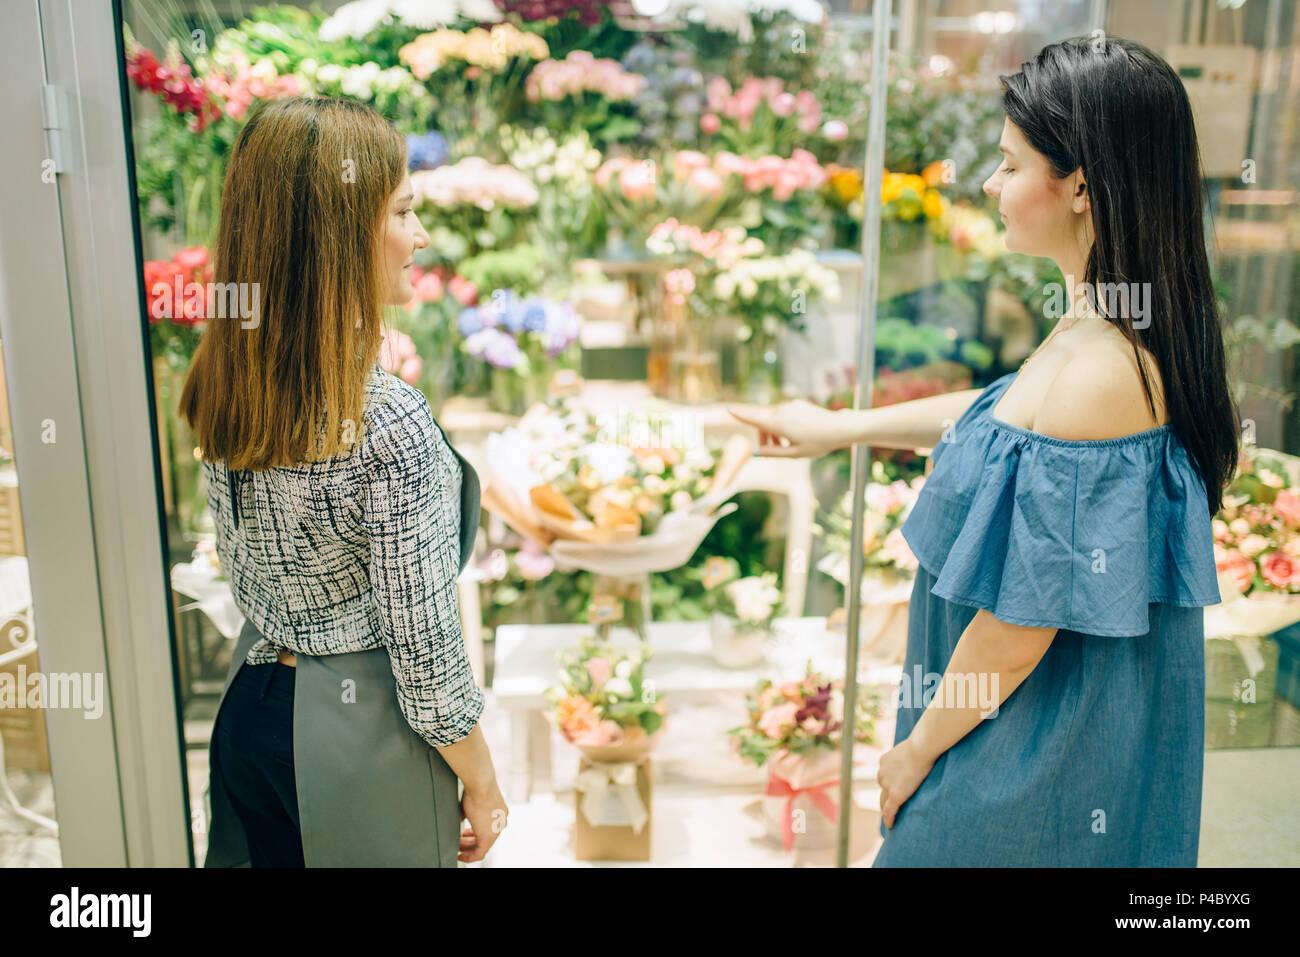 Female customer and florist chooses flowers - Stock Image